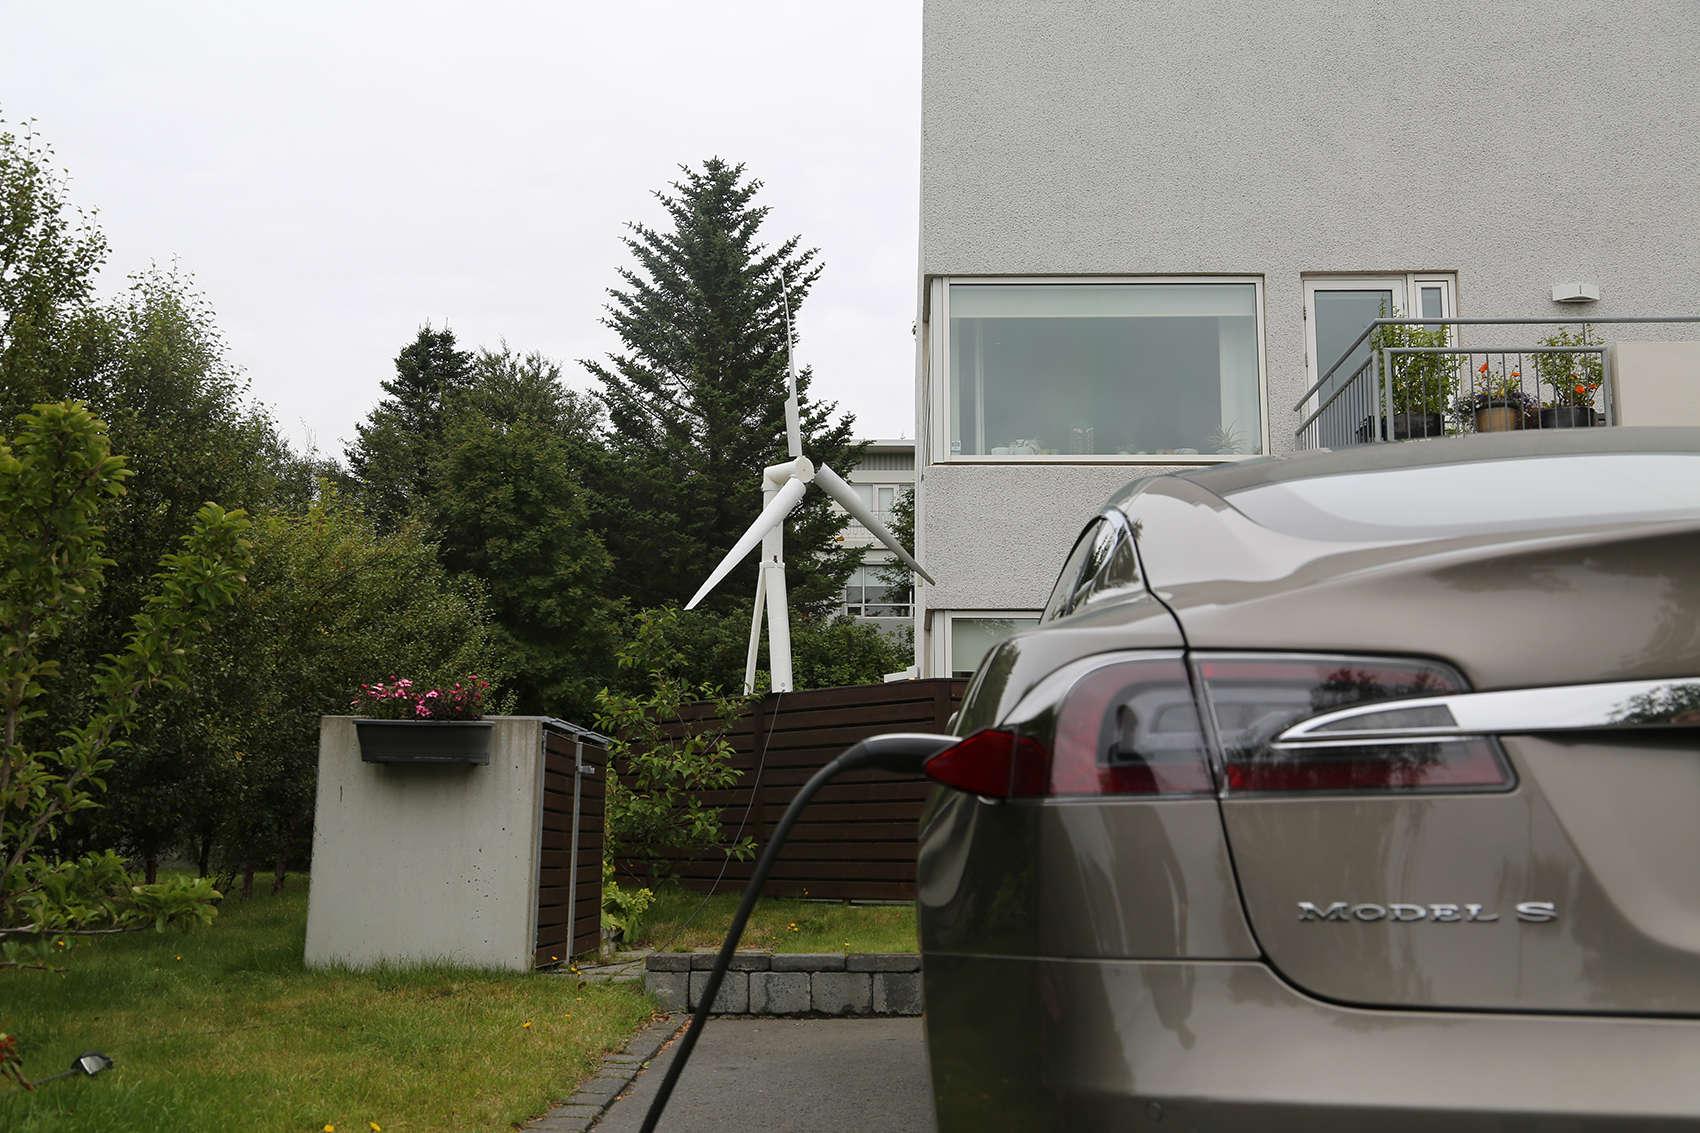 A Trinity turbine powering a house and an electric car.